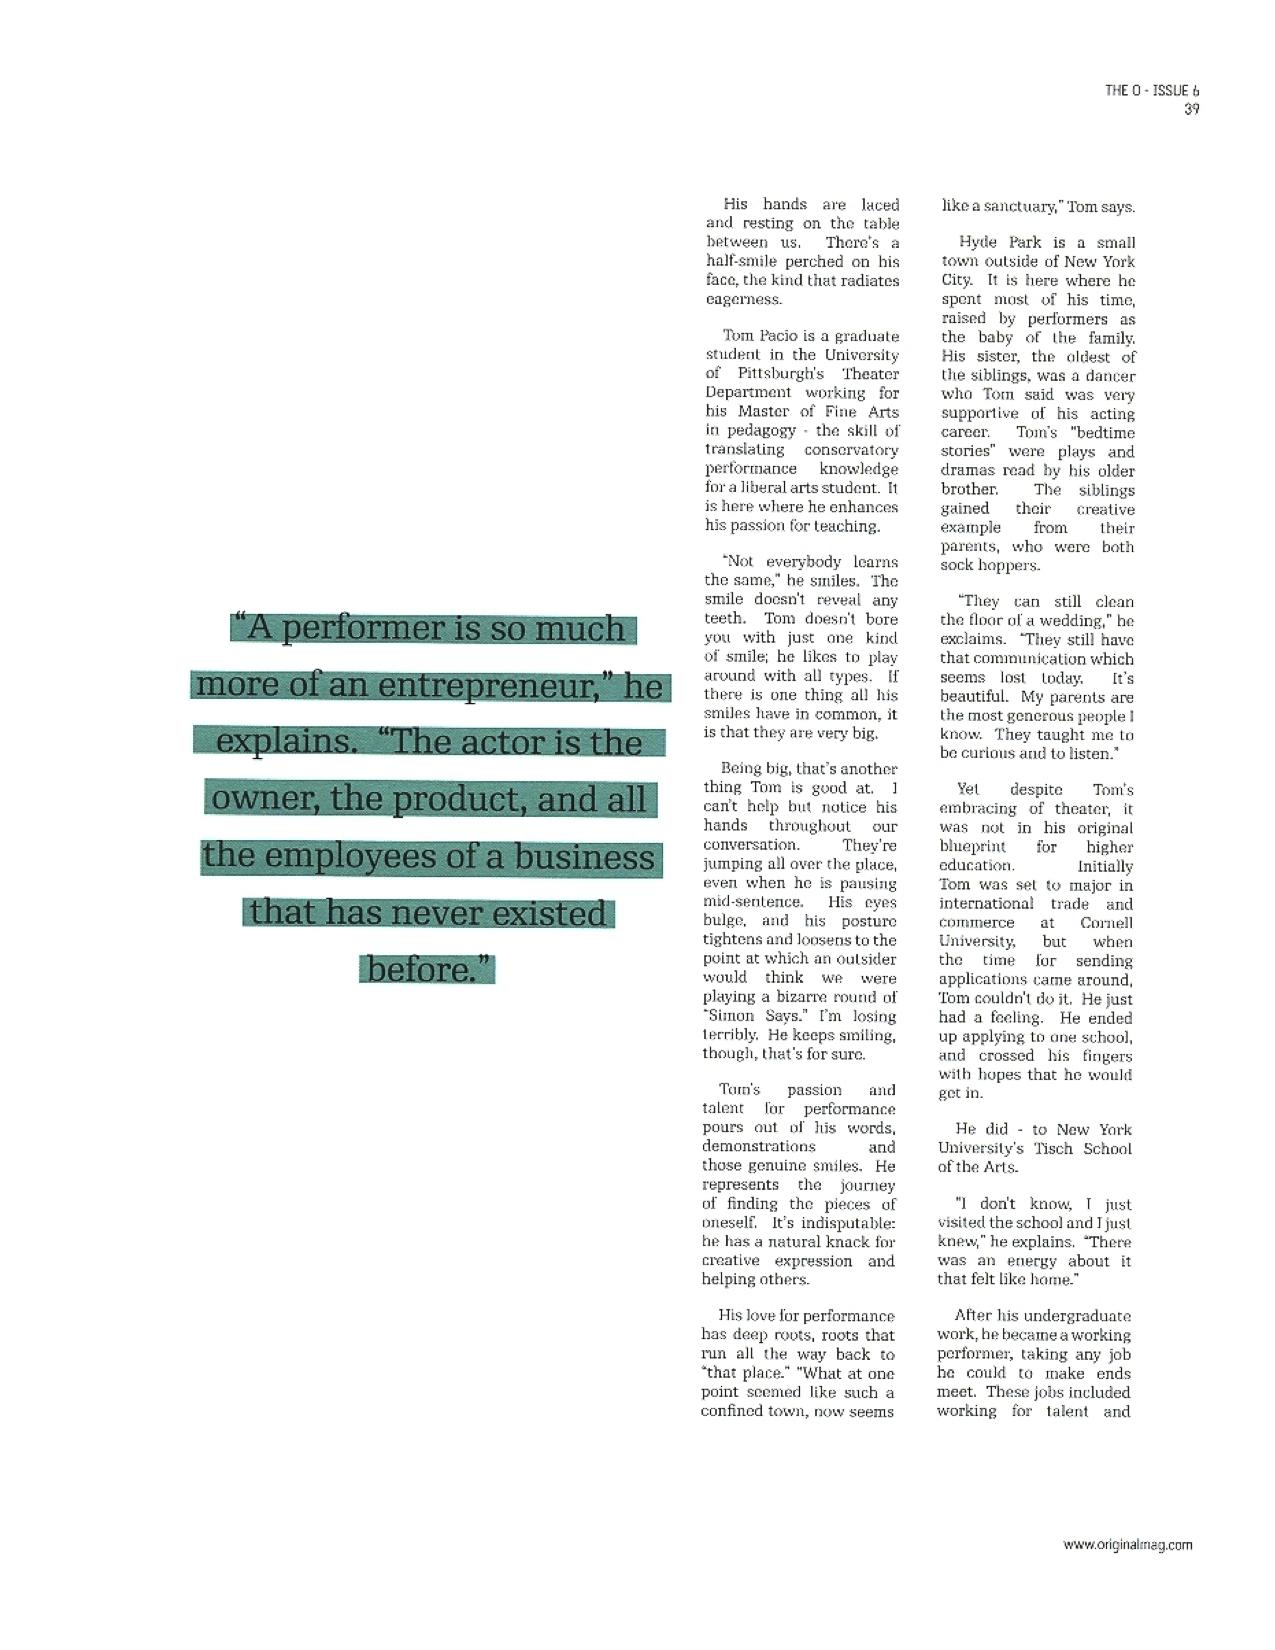 Tom-Pacio-Article2.jpg